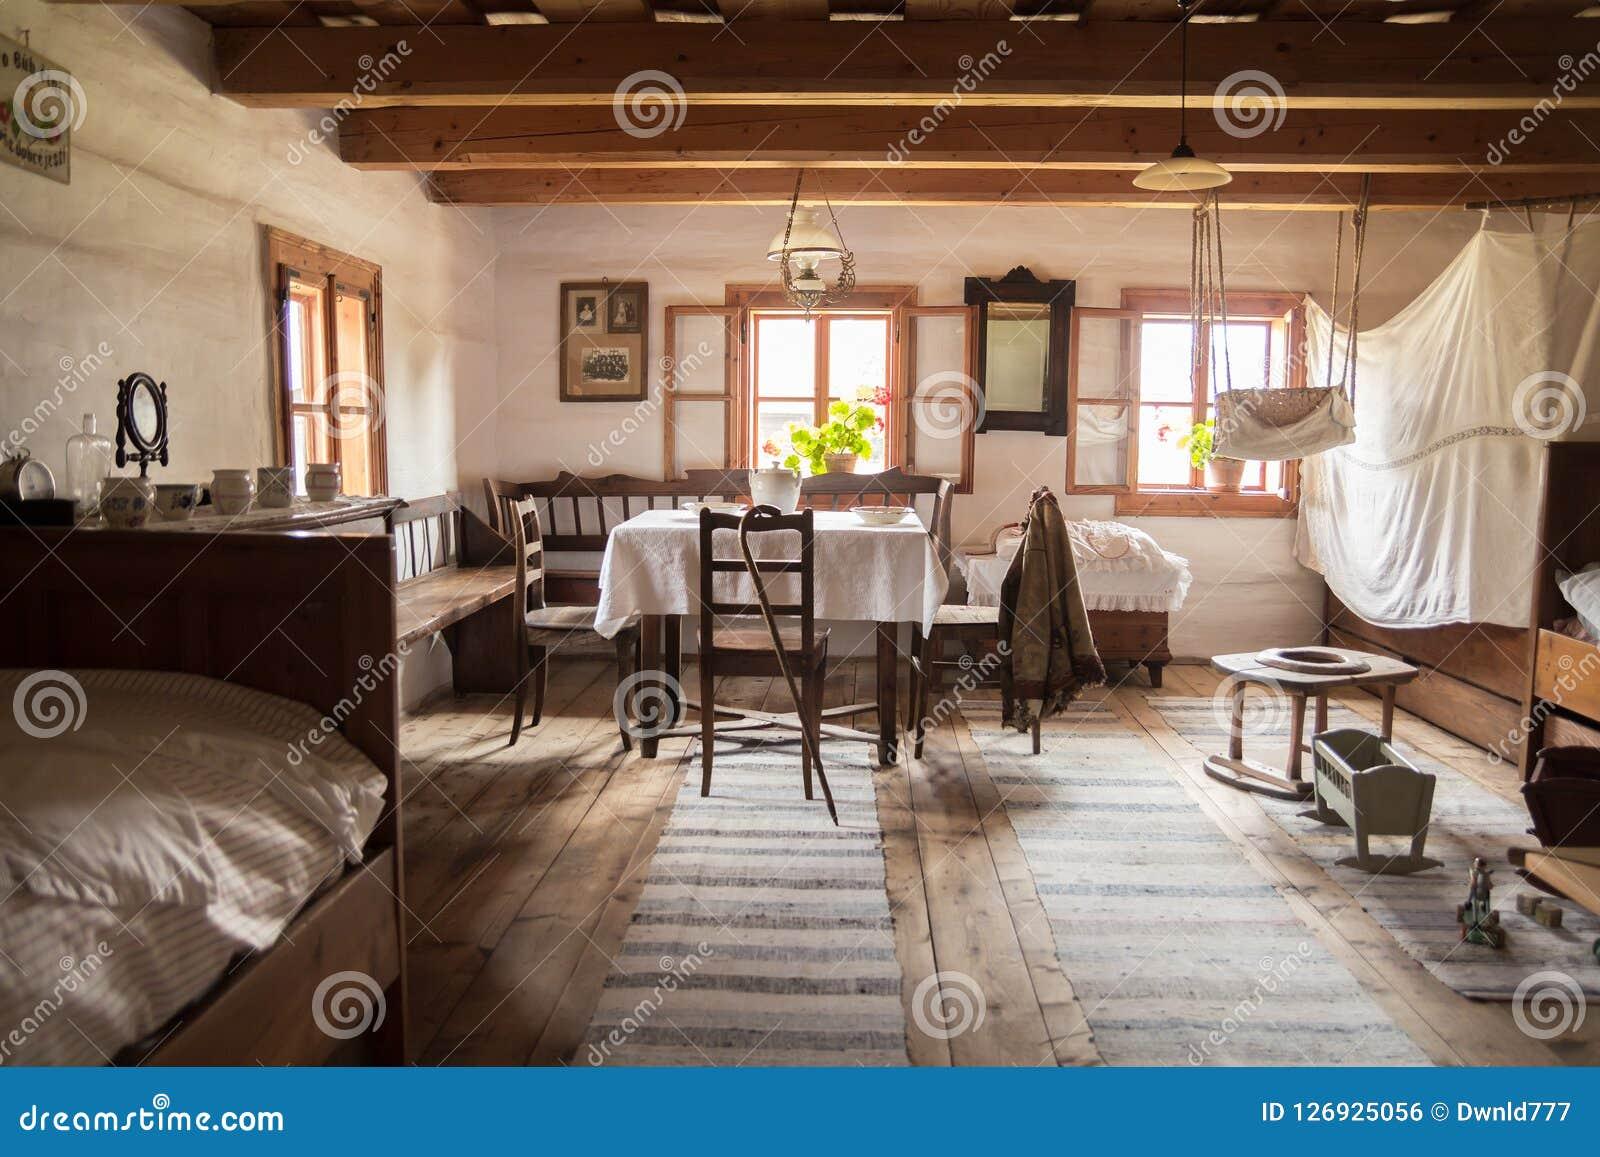 Sitio popular histórico tradicional en Eslovaquia